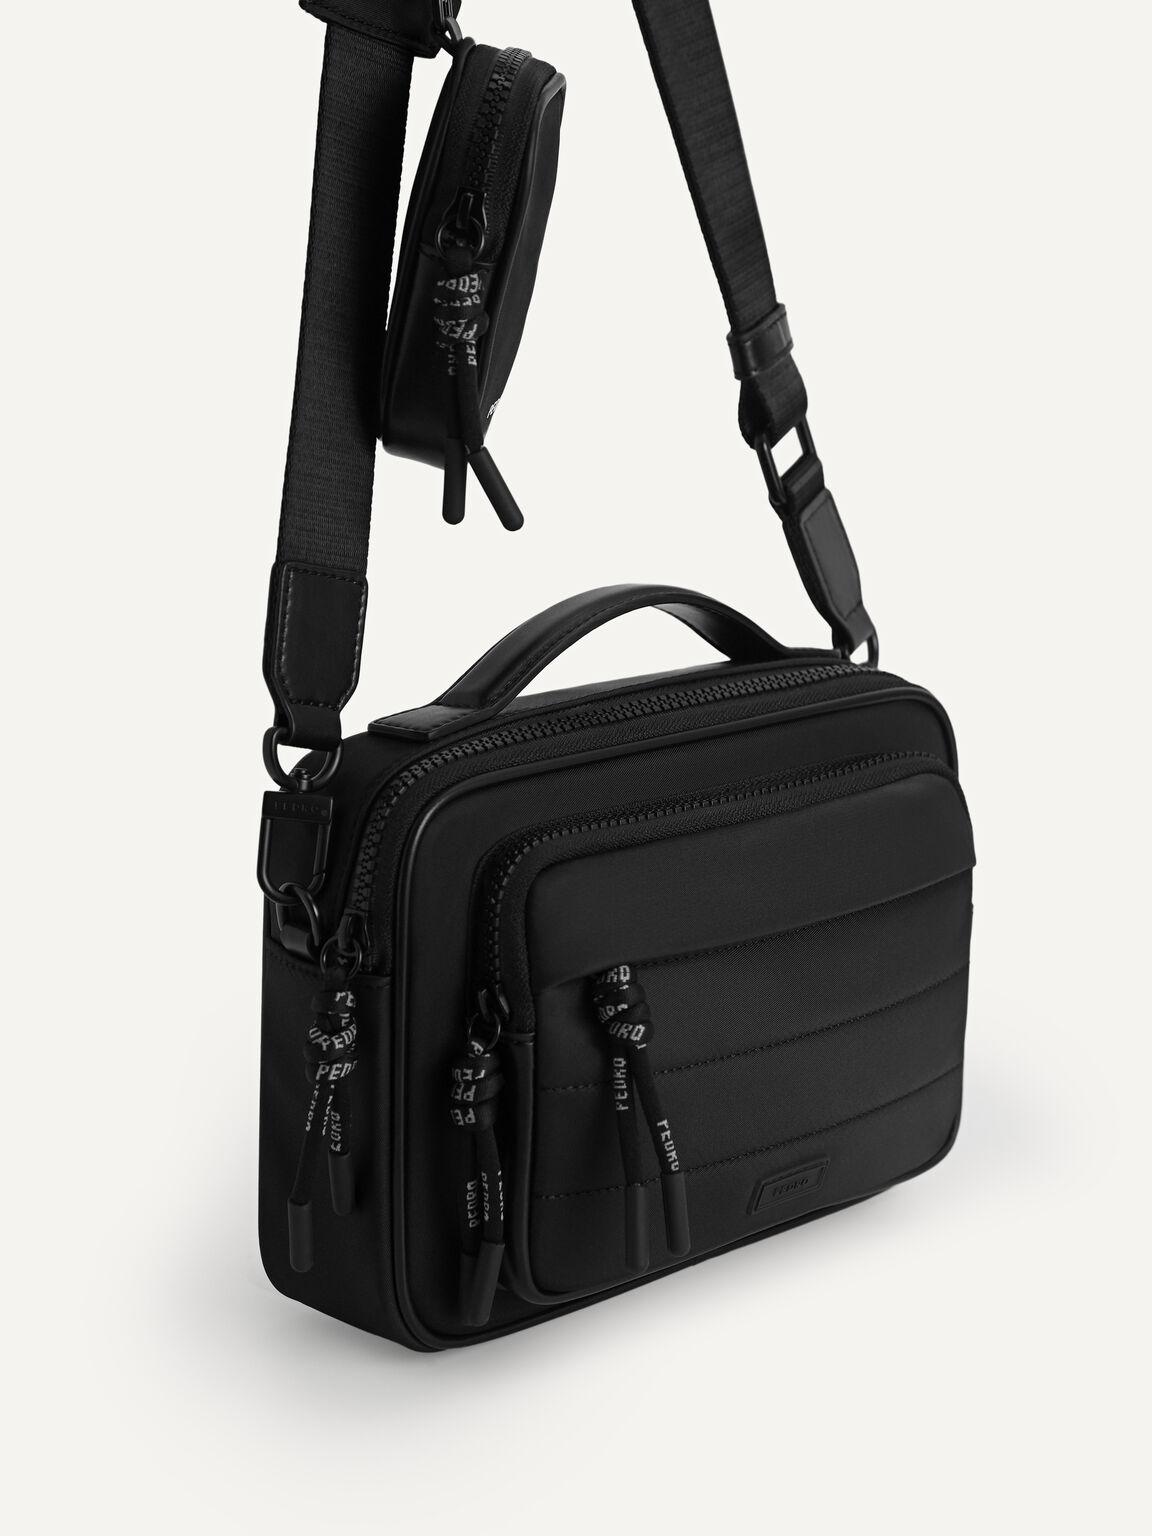 Nylon Sling Bag, Black, hi-res